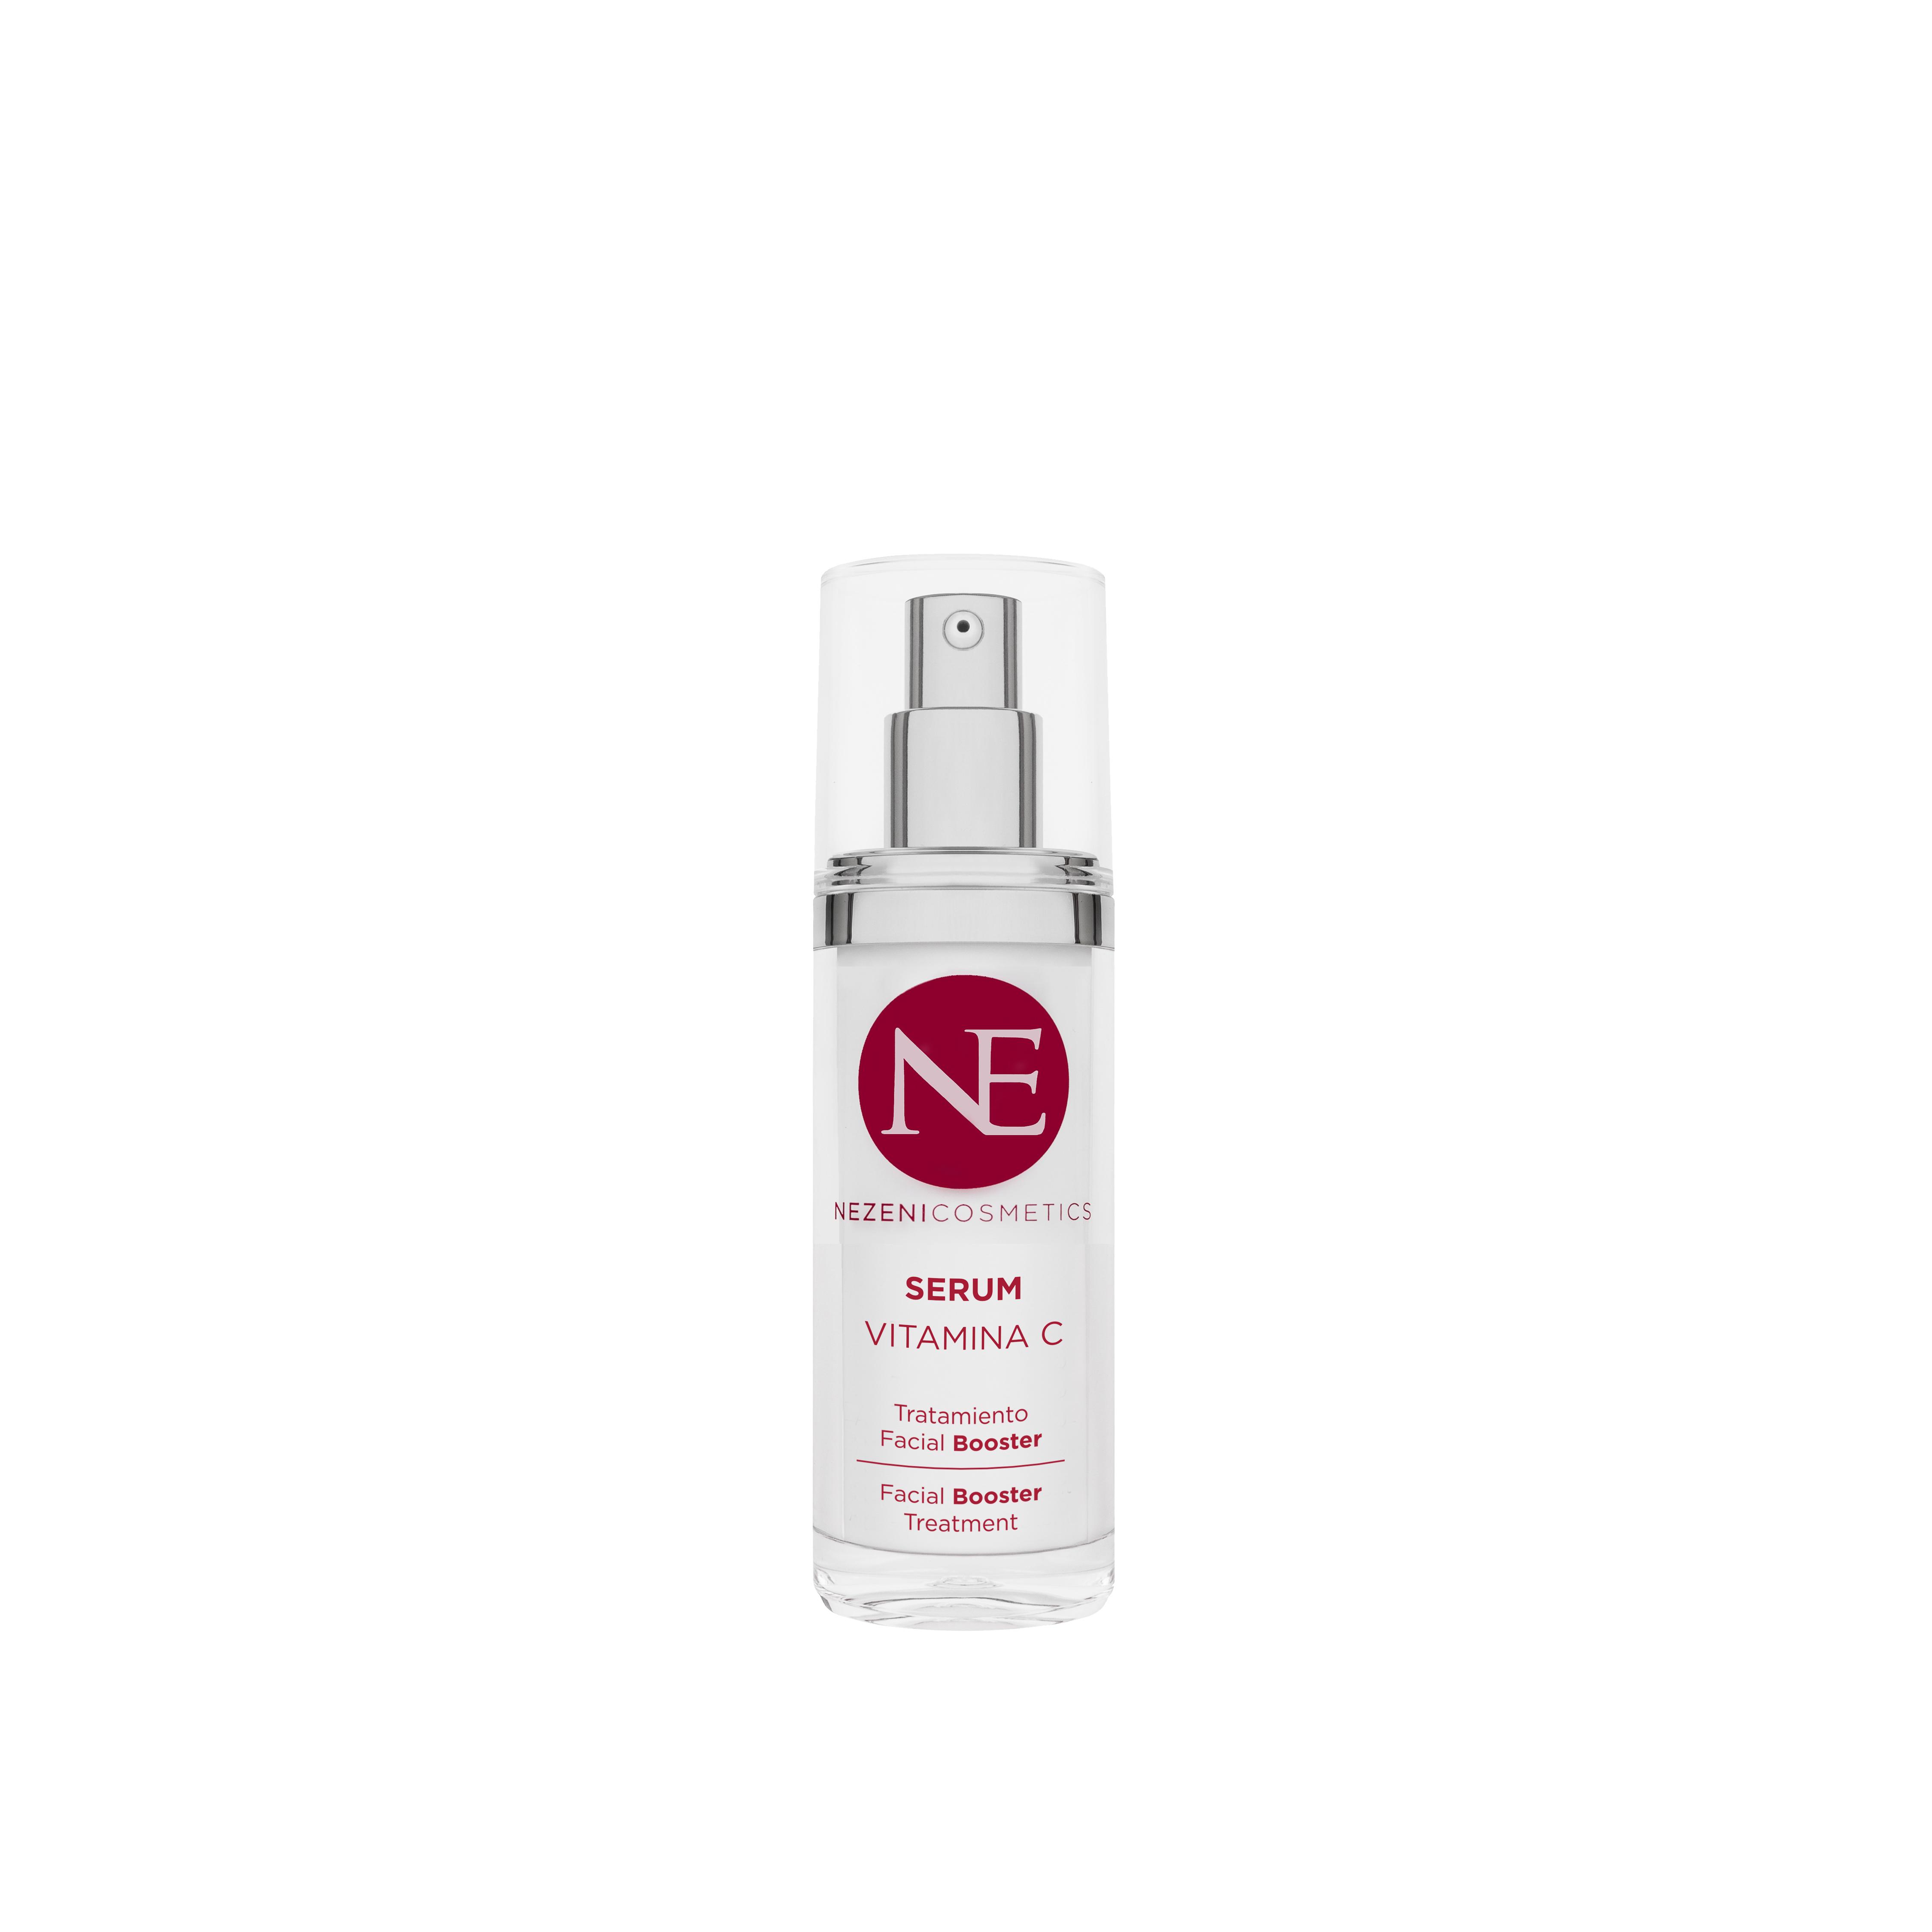 Review Serum Vitamina C de Nezeni Cosmetics